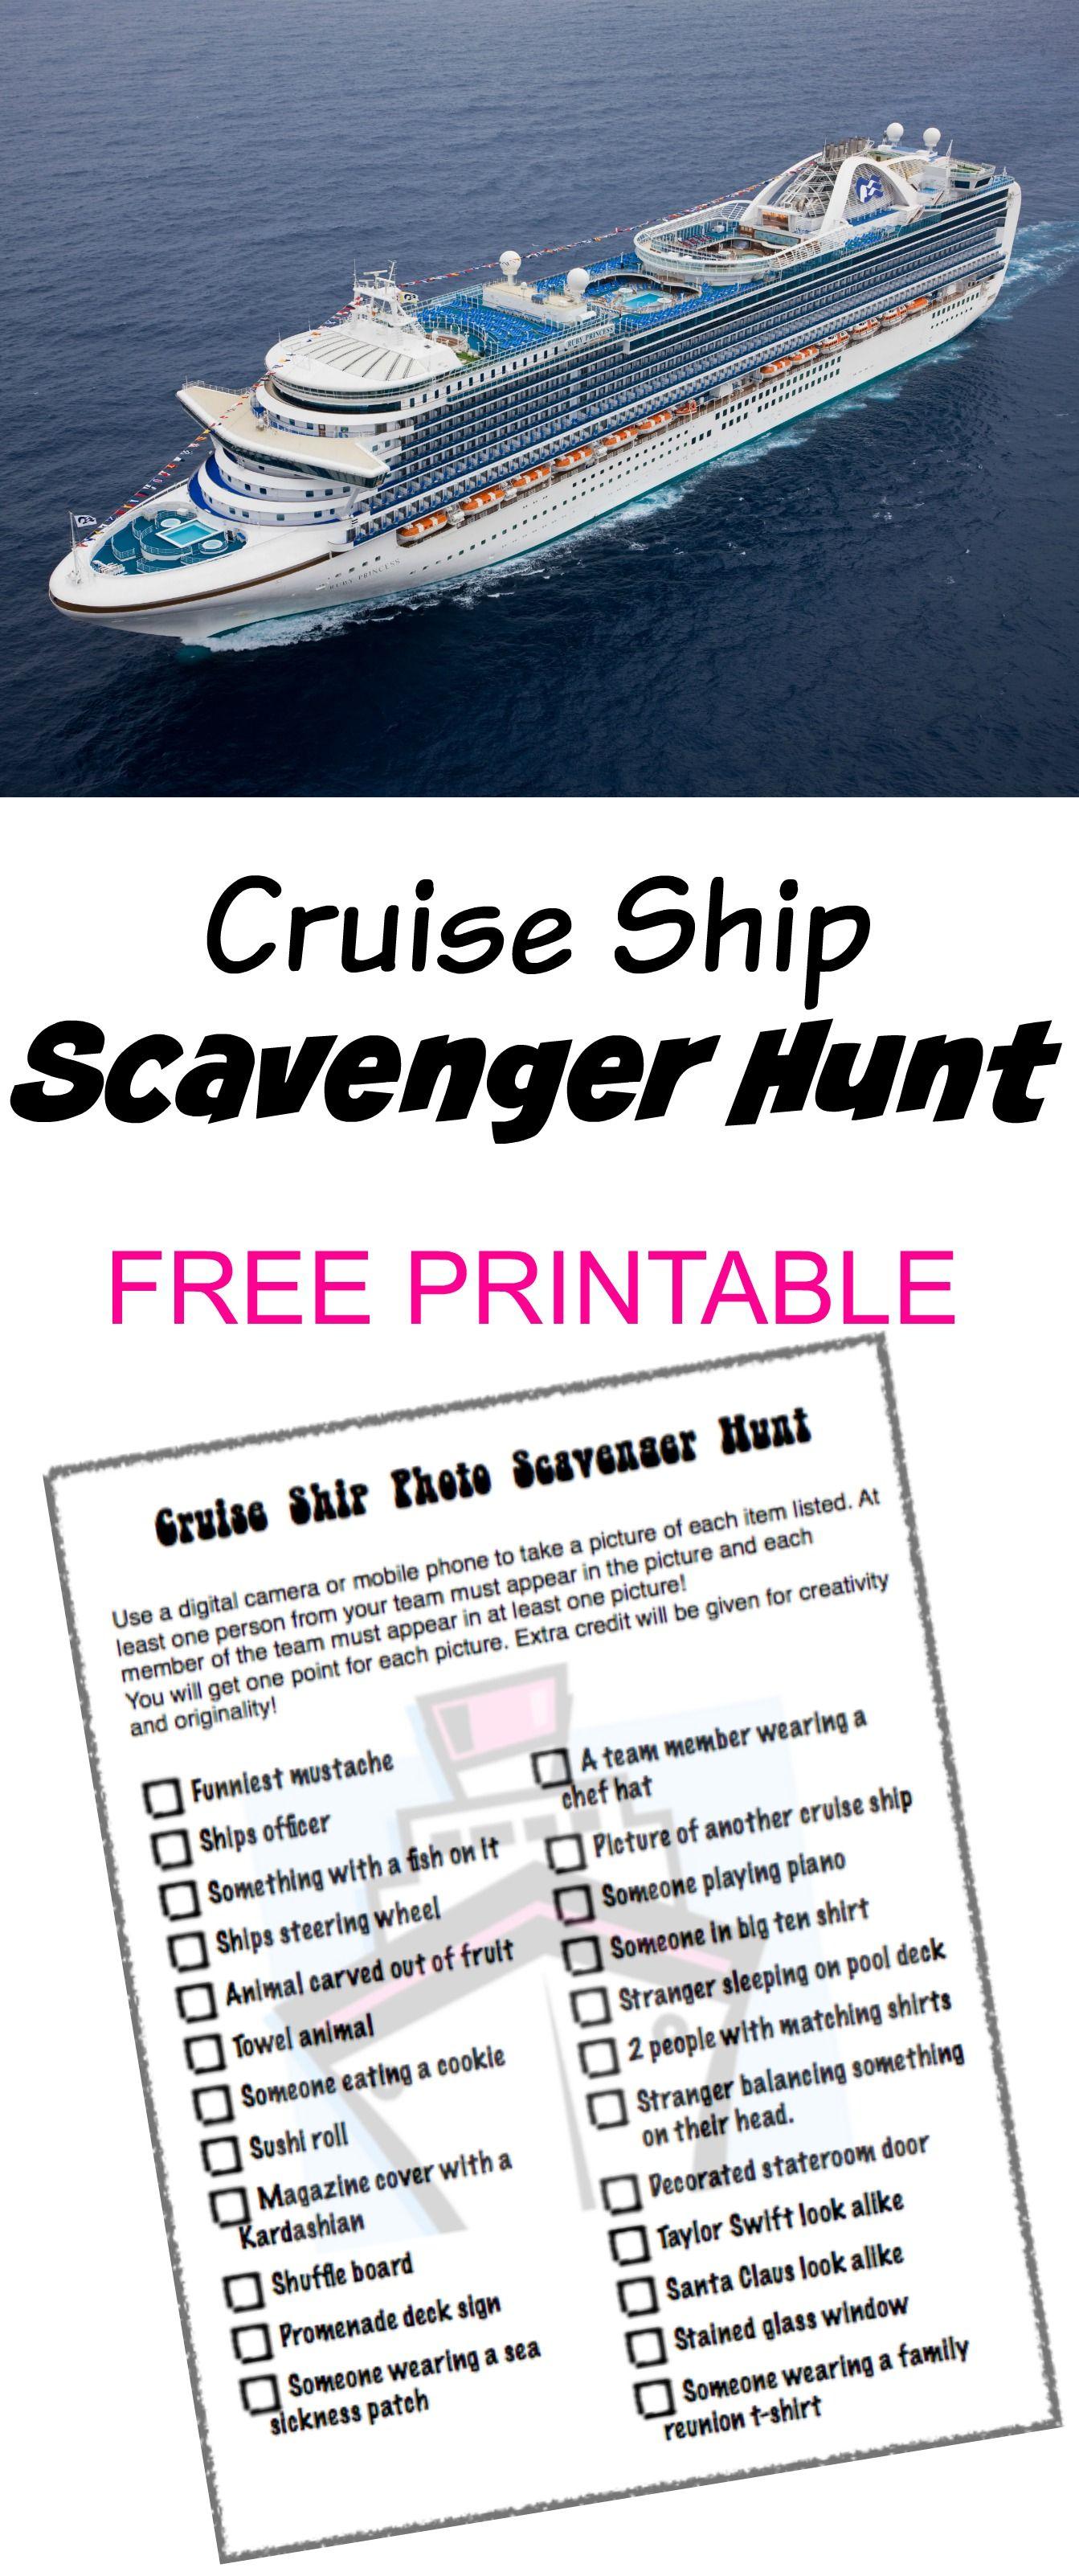 Cruise Ship Photo Scavenger Hunt Free Printable Great